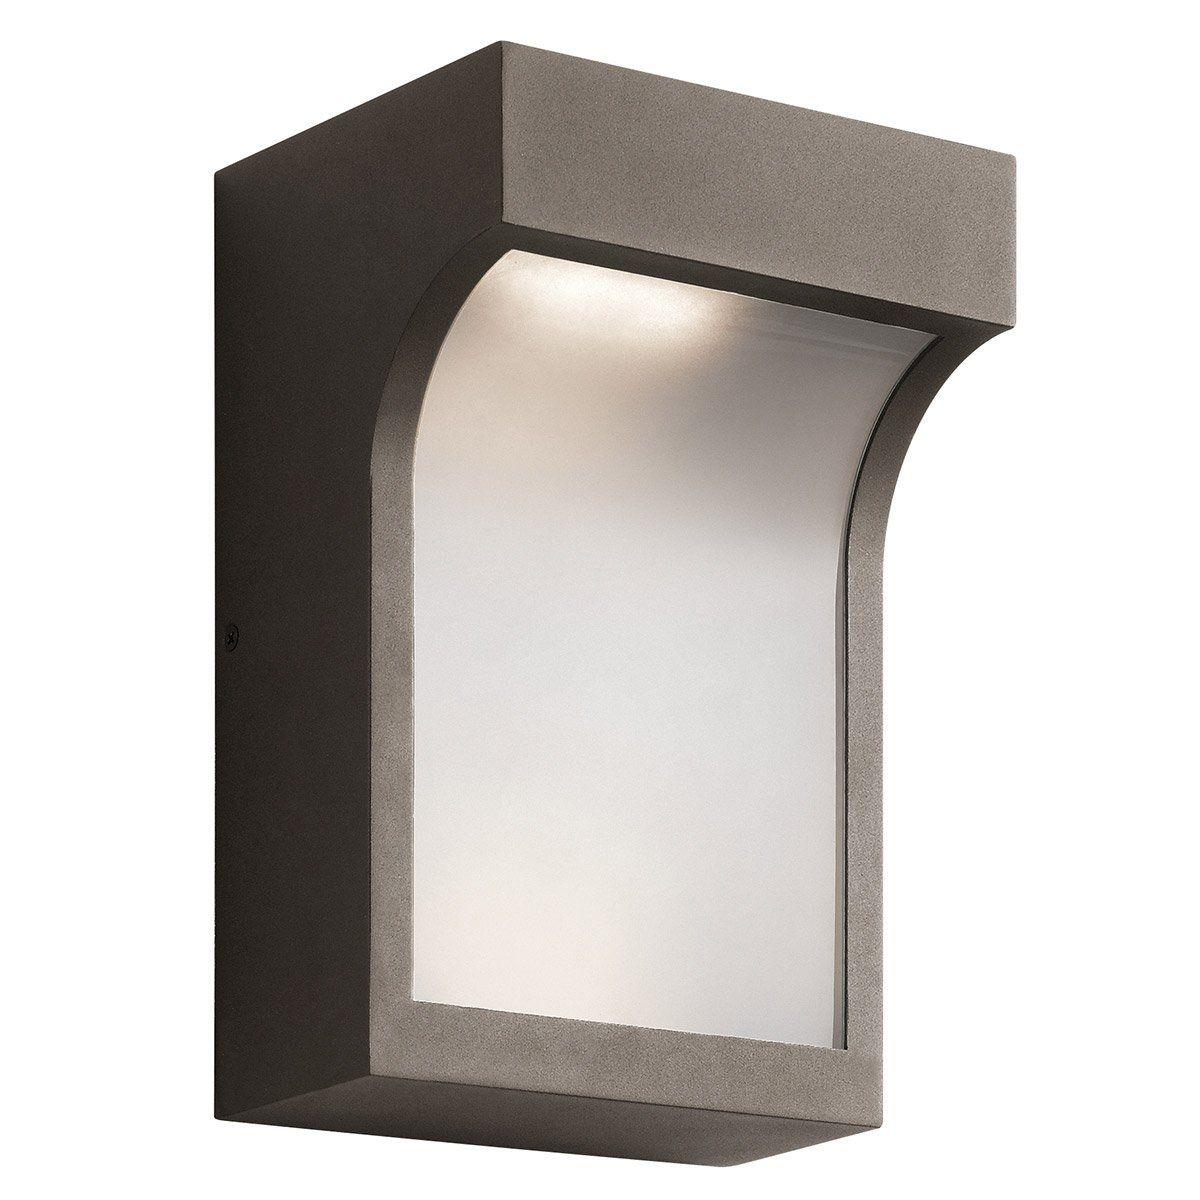 Kichler lighting aztled shelby light inch textured